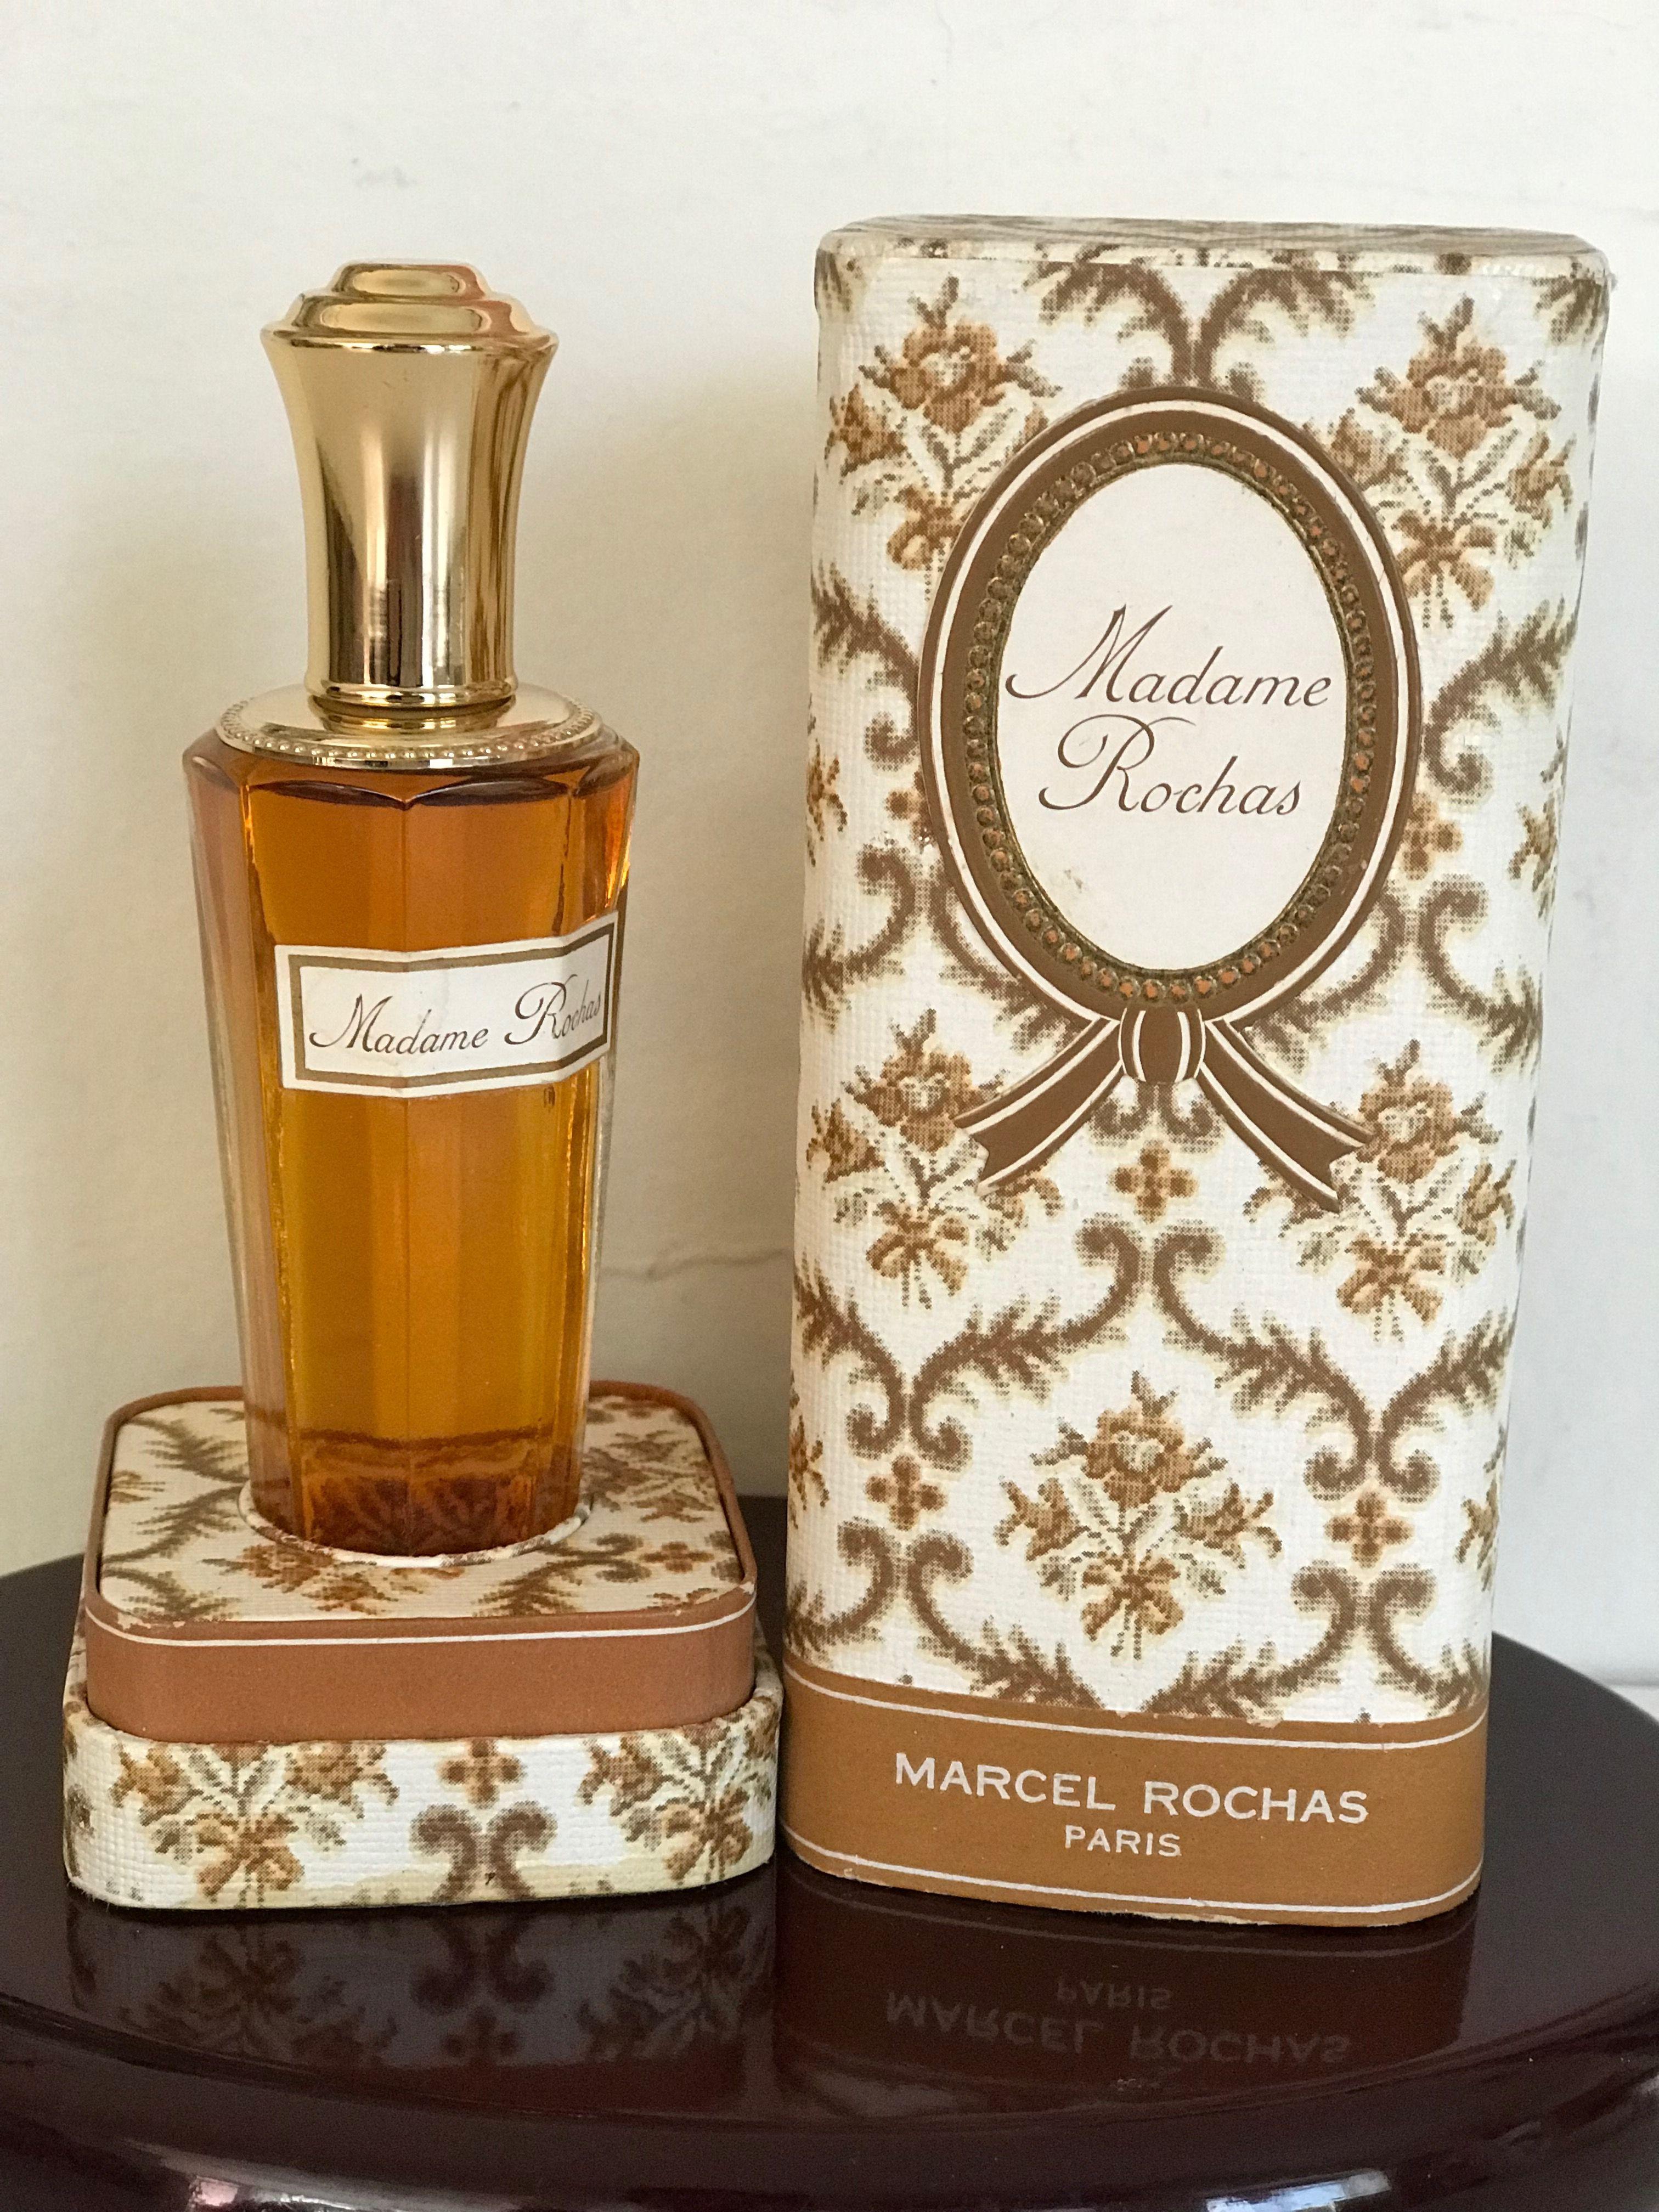 902749d919e350 MADAME ROCHAS PERFUME | Parfums in 2019 | Perfume, Hermes perfume ...